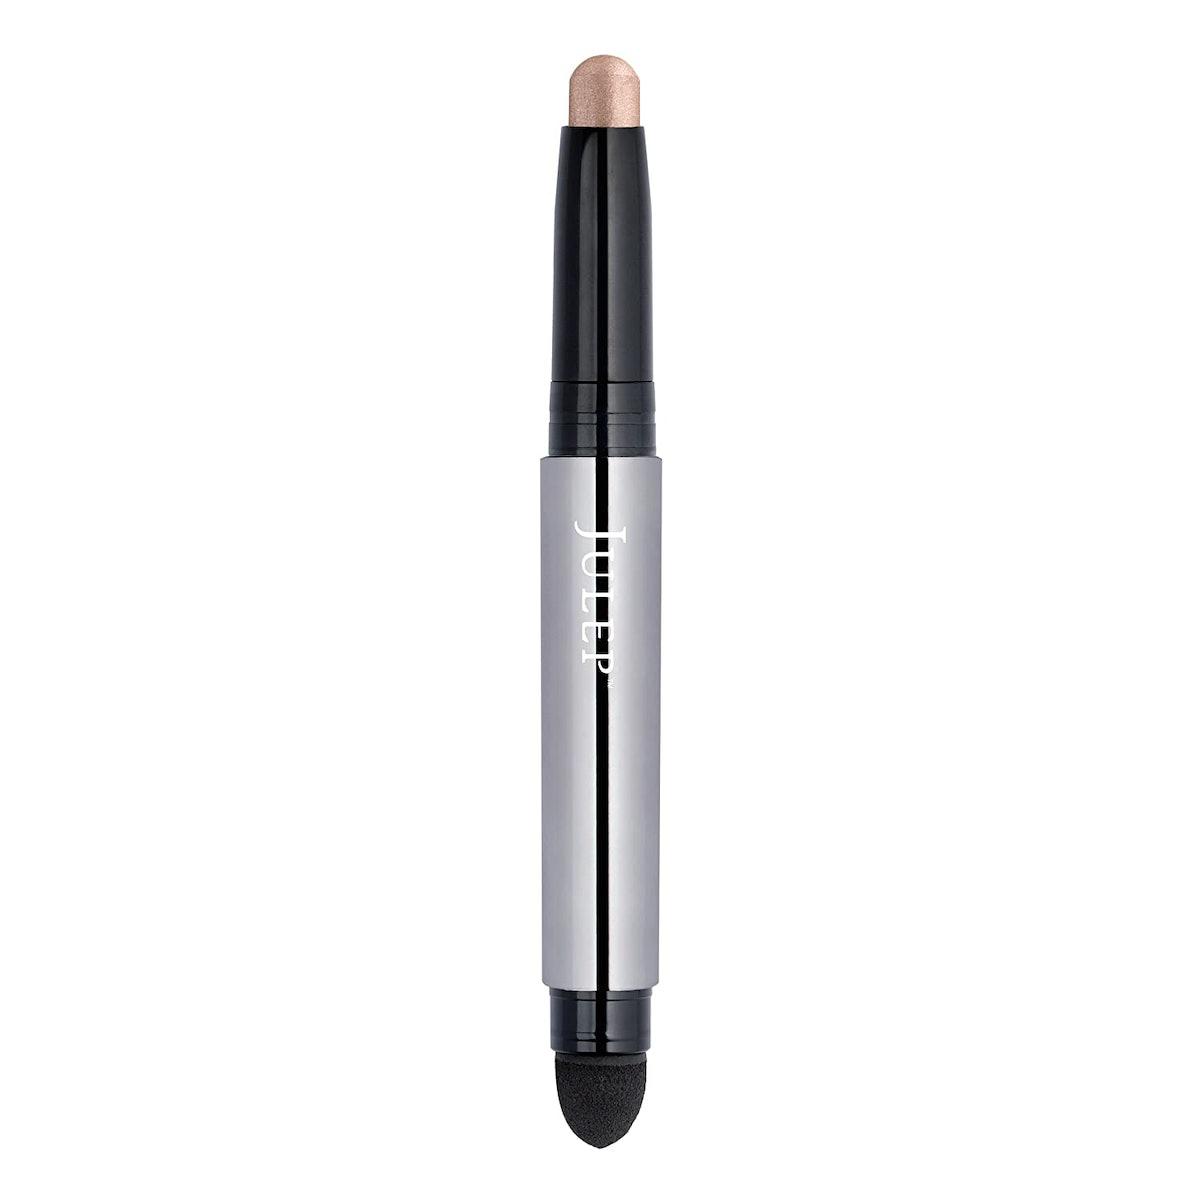 Julep Crème to Powder Waterproof Eyeshadow Stick